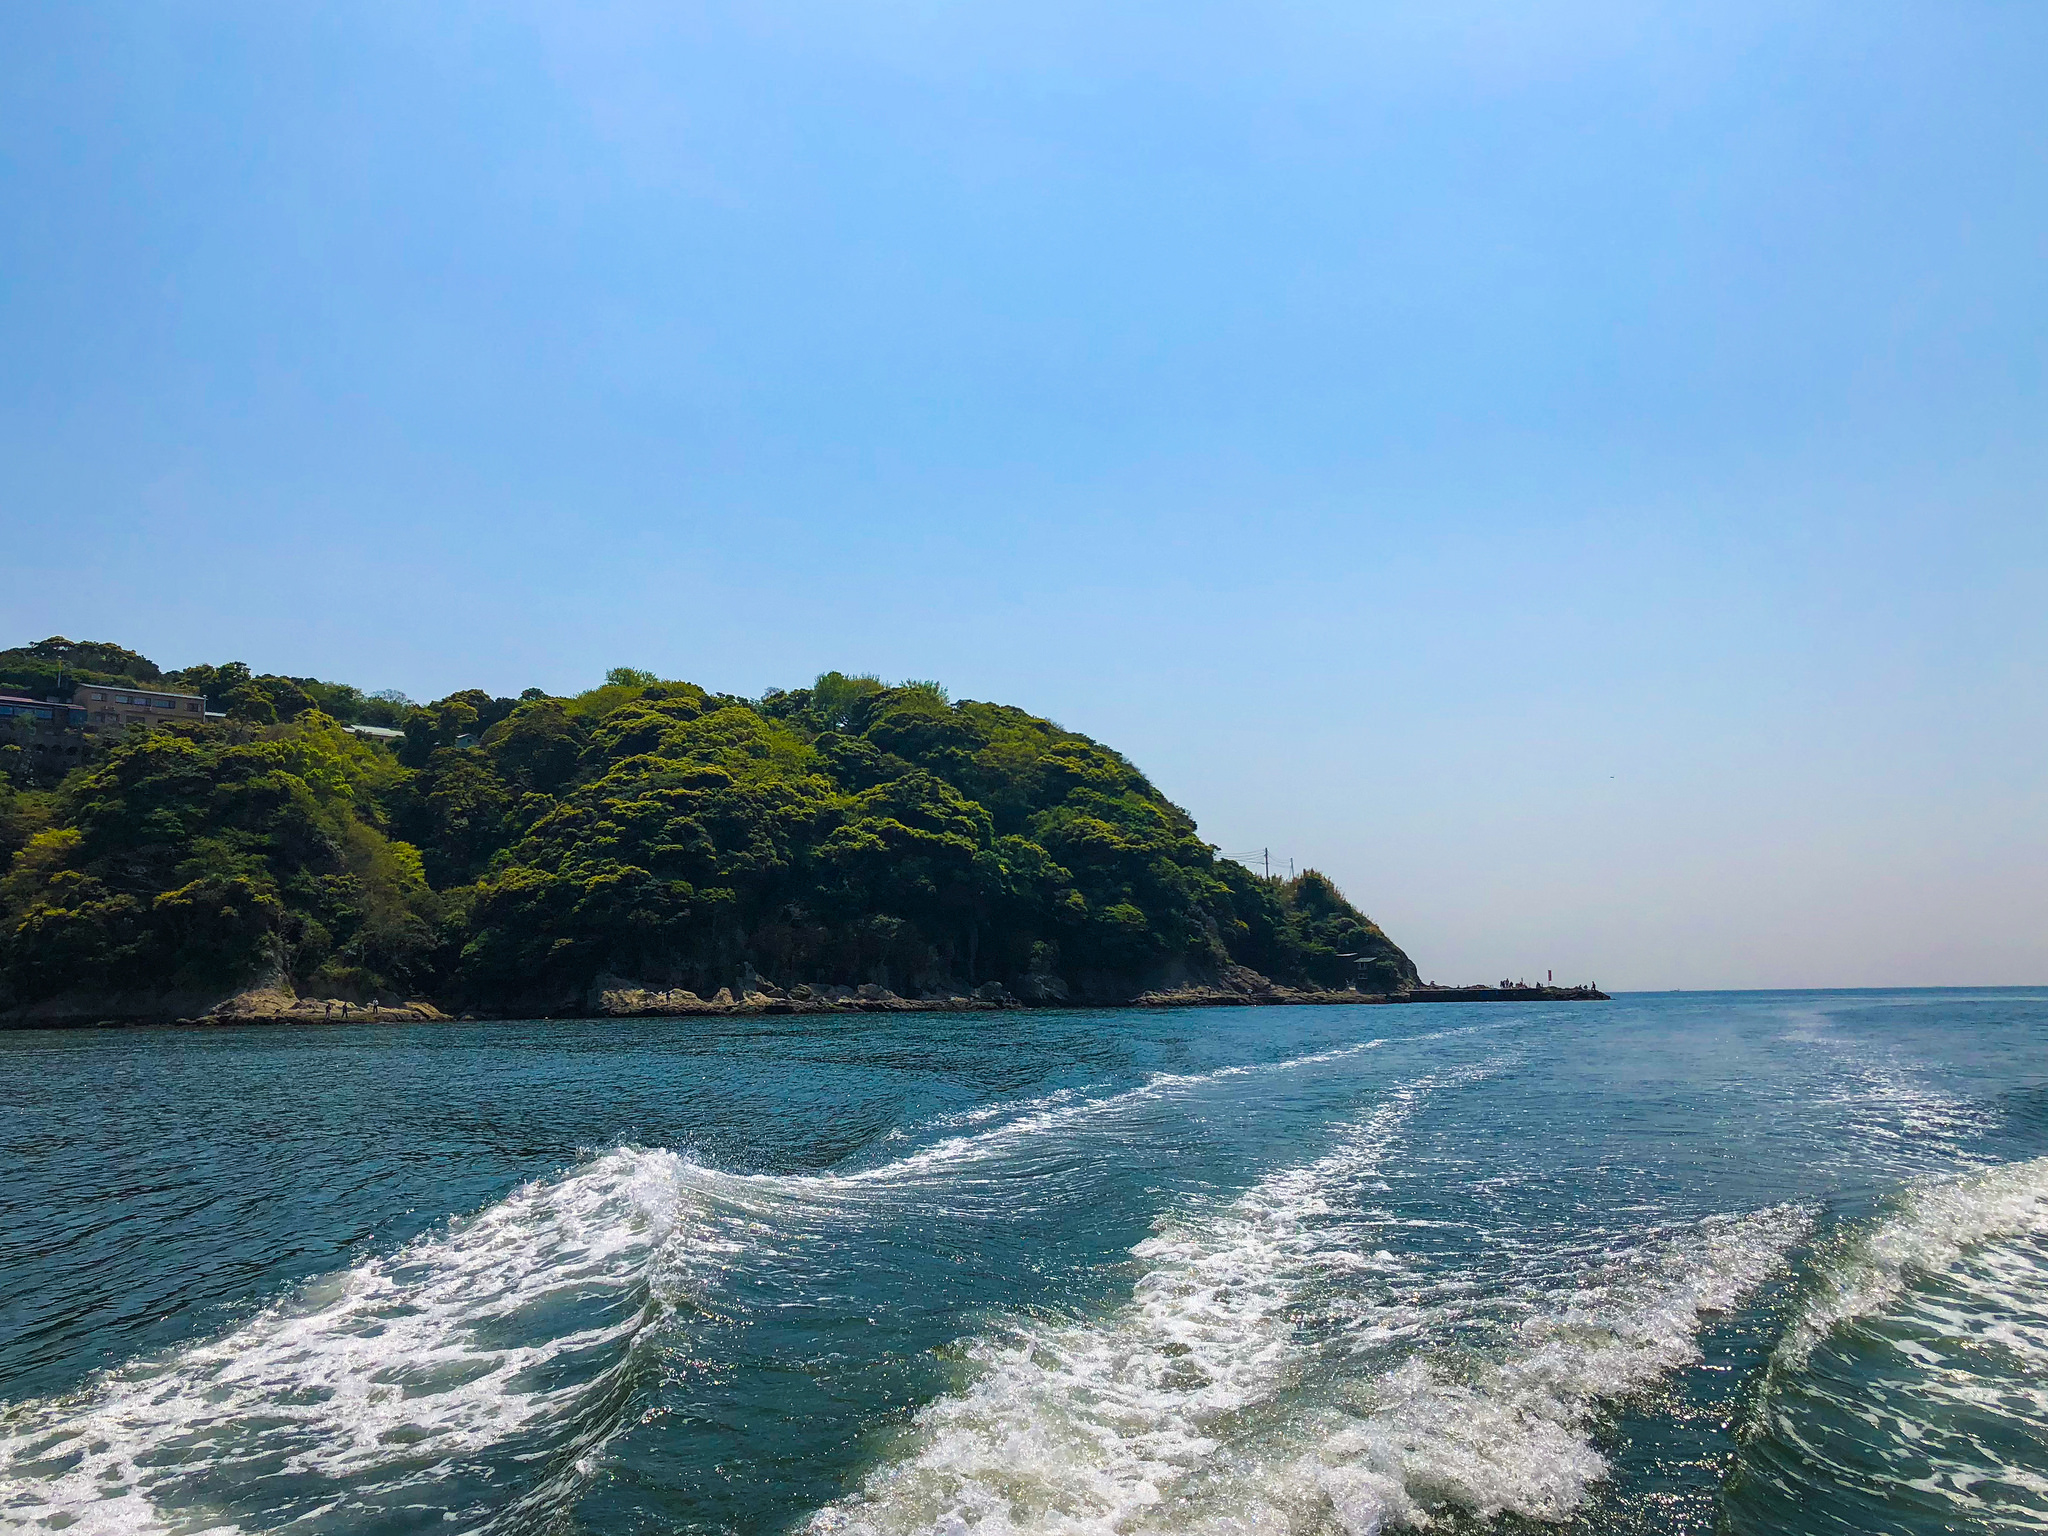 Self Guided Tour to Exploring a Day Trip to Enoshima Island